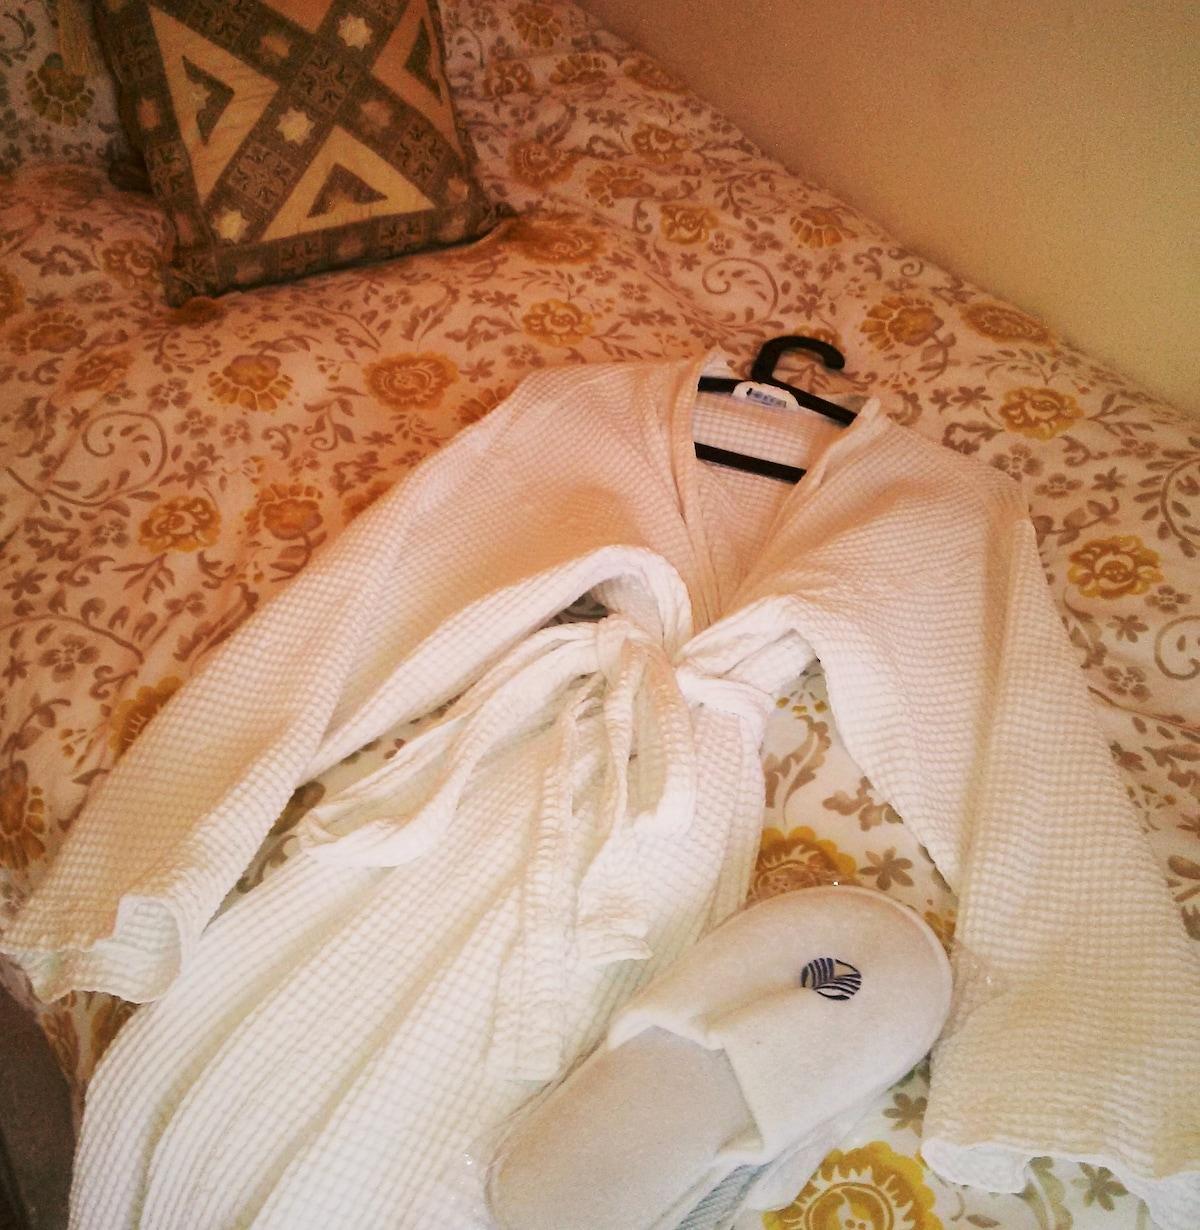 waffle bathrobe and slippers provided